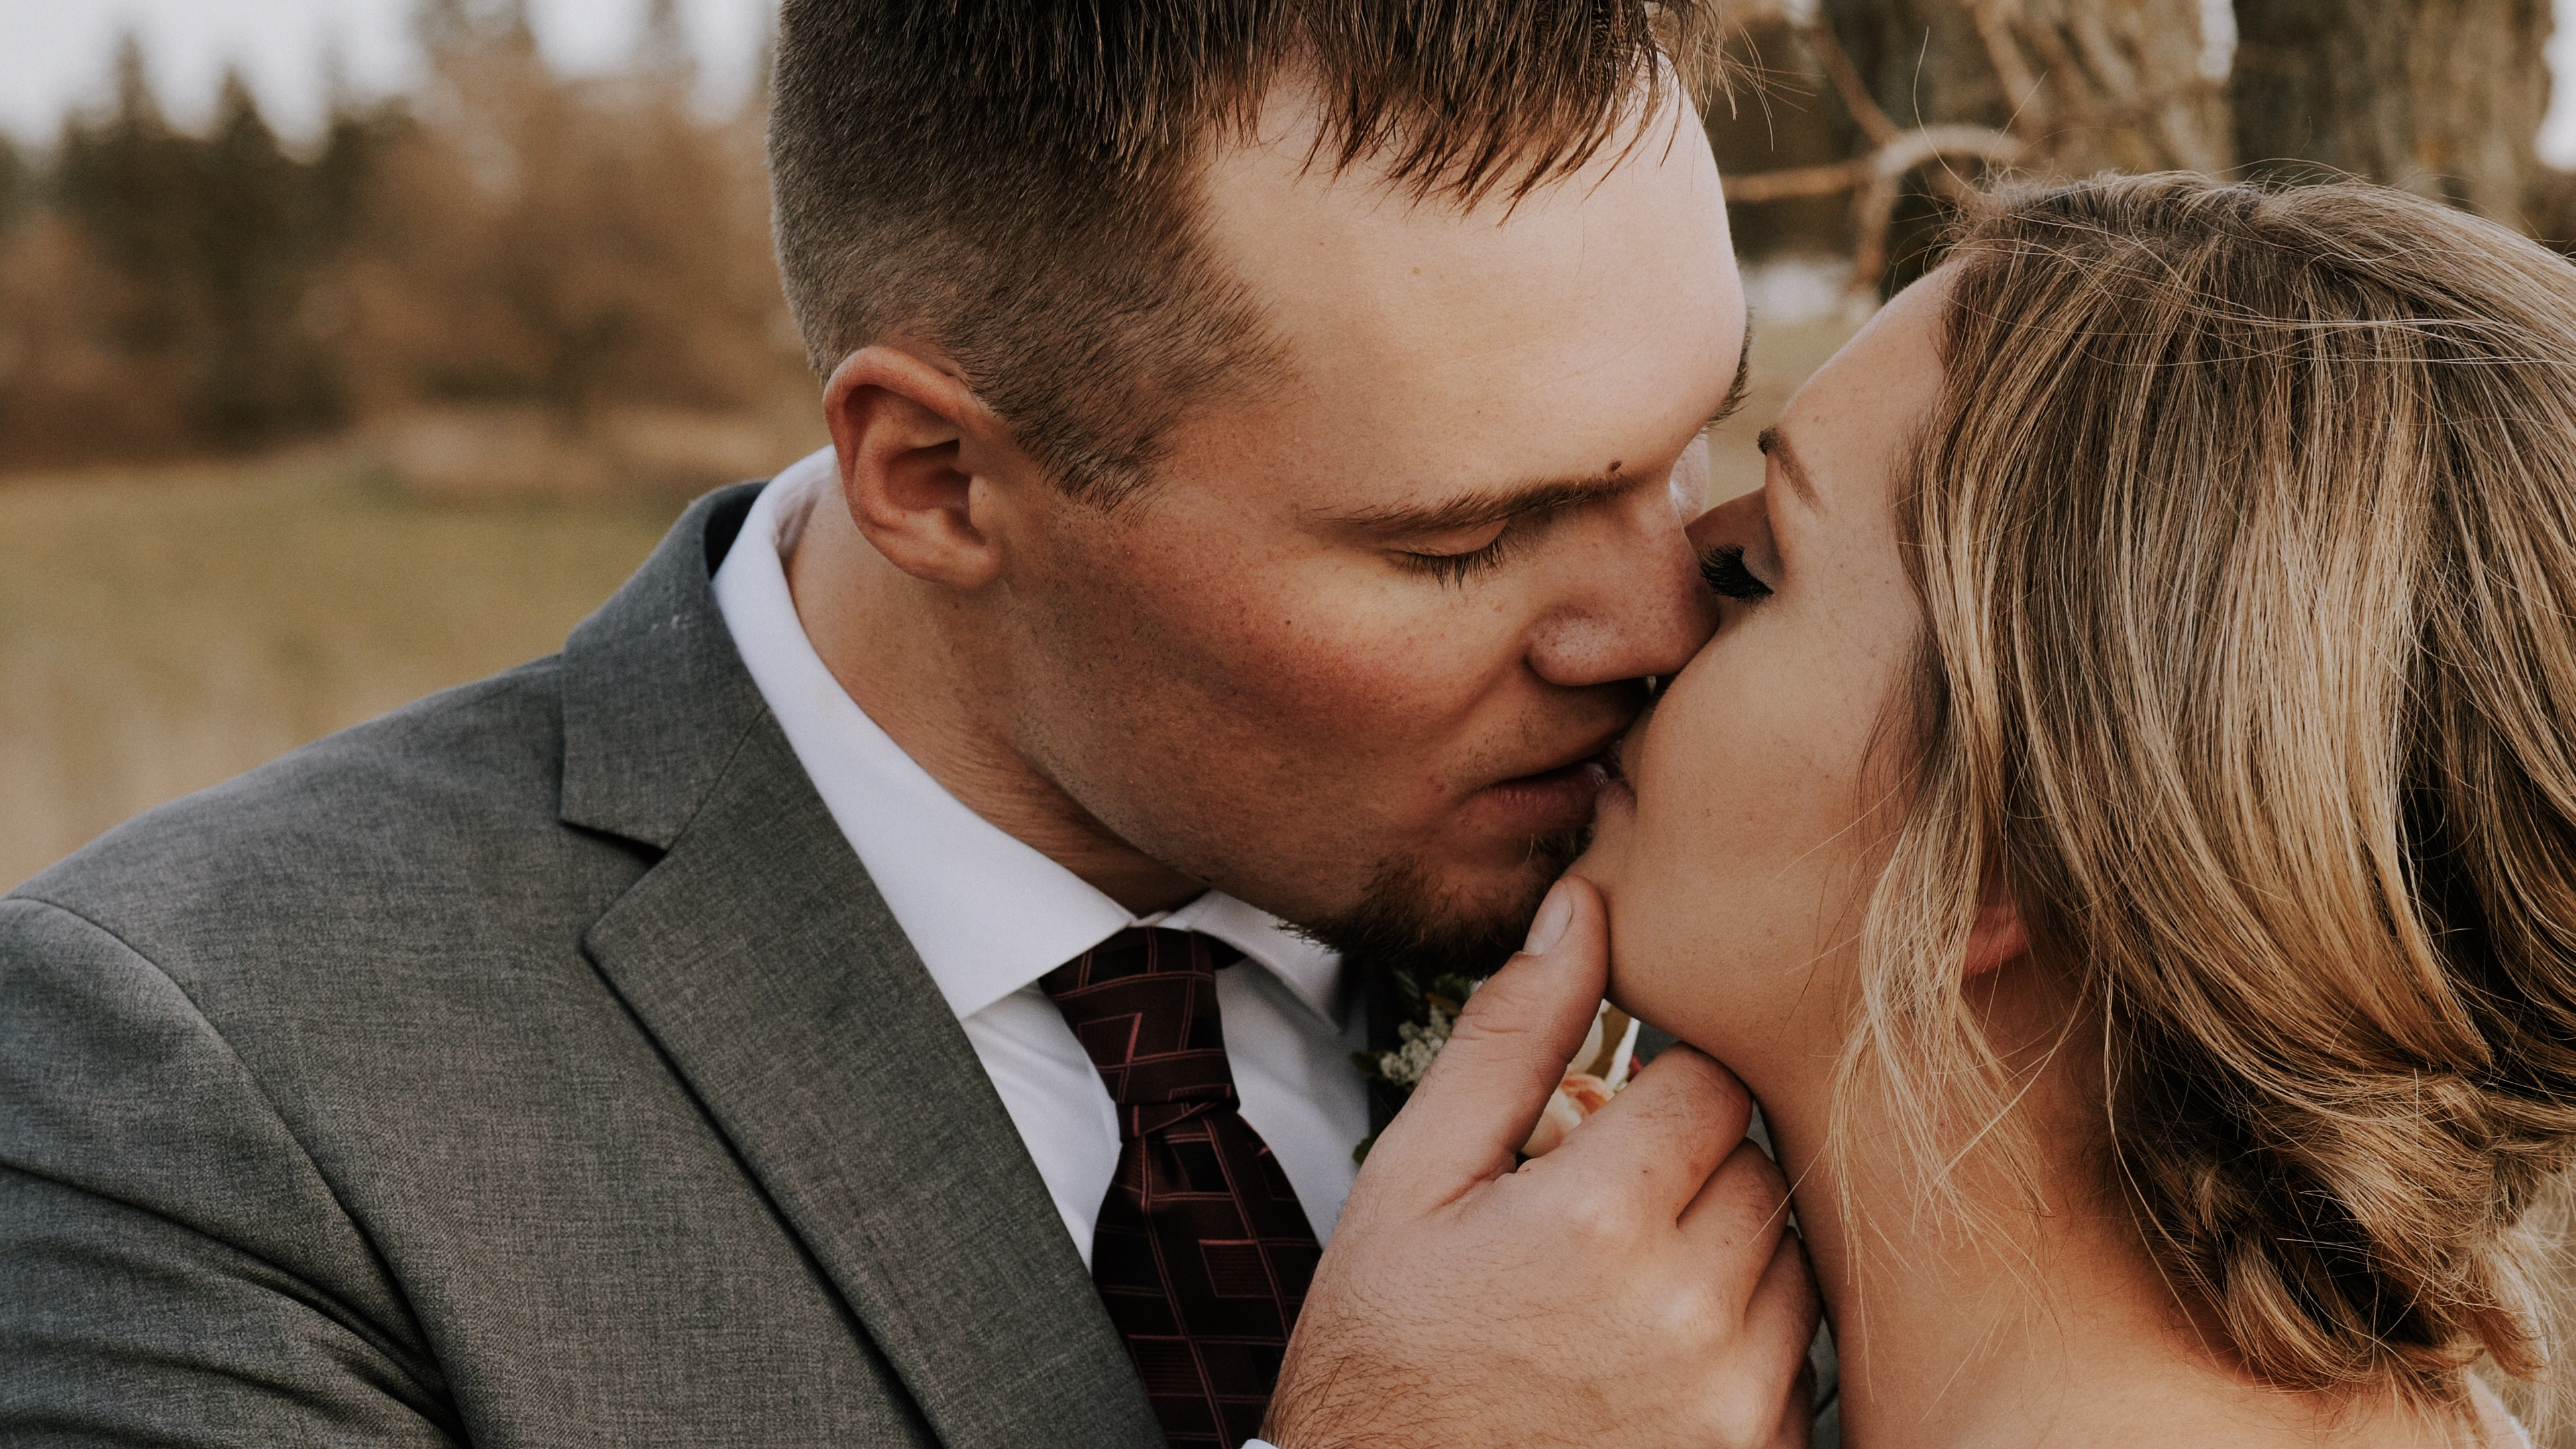 Stephanie + Ryan | Des Moines, Iowa | Barn on the Hill